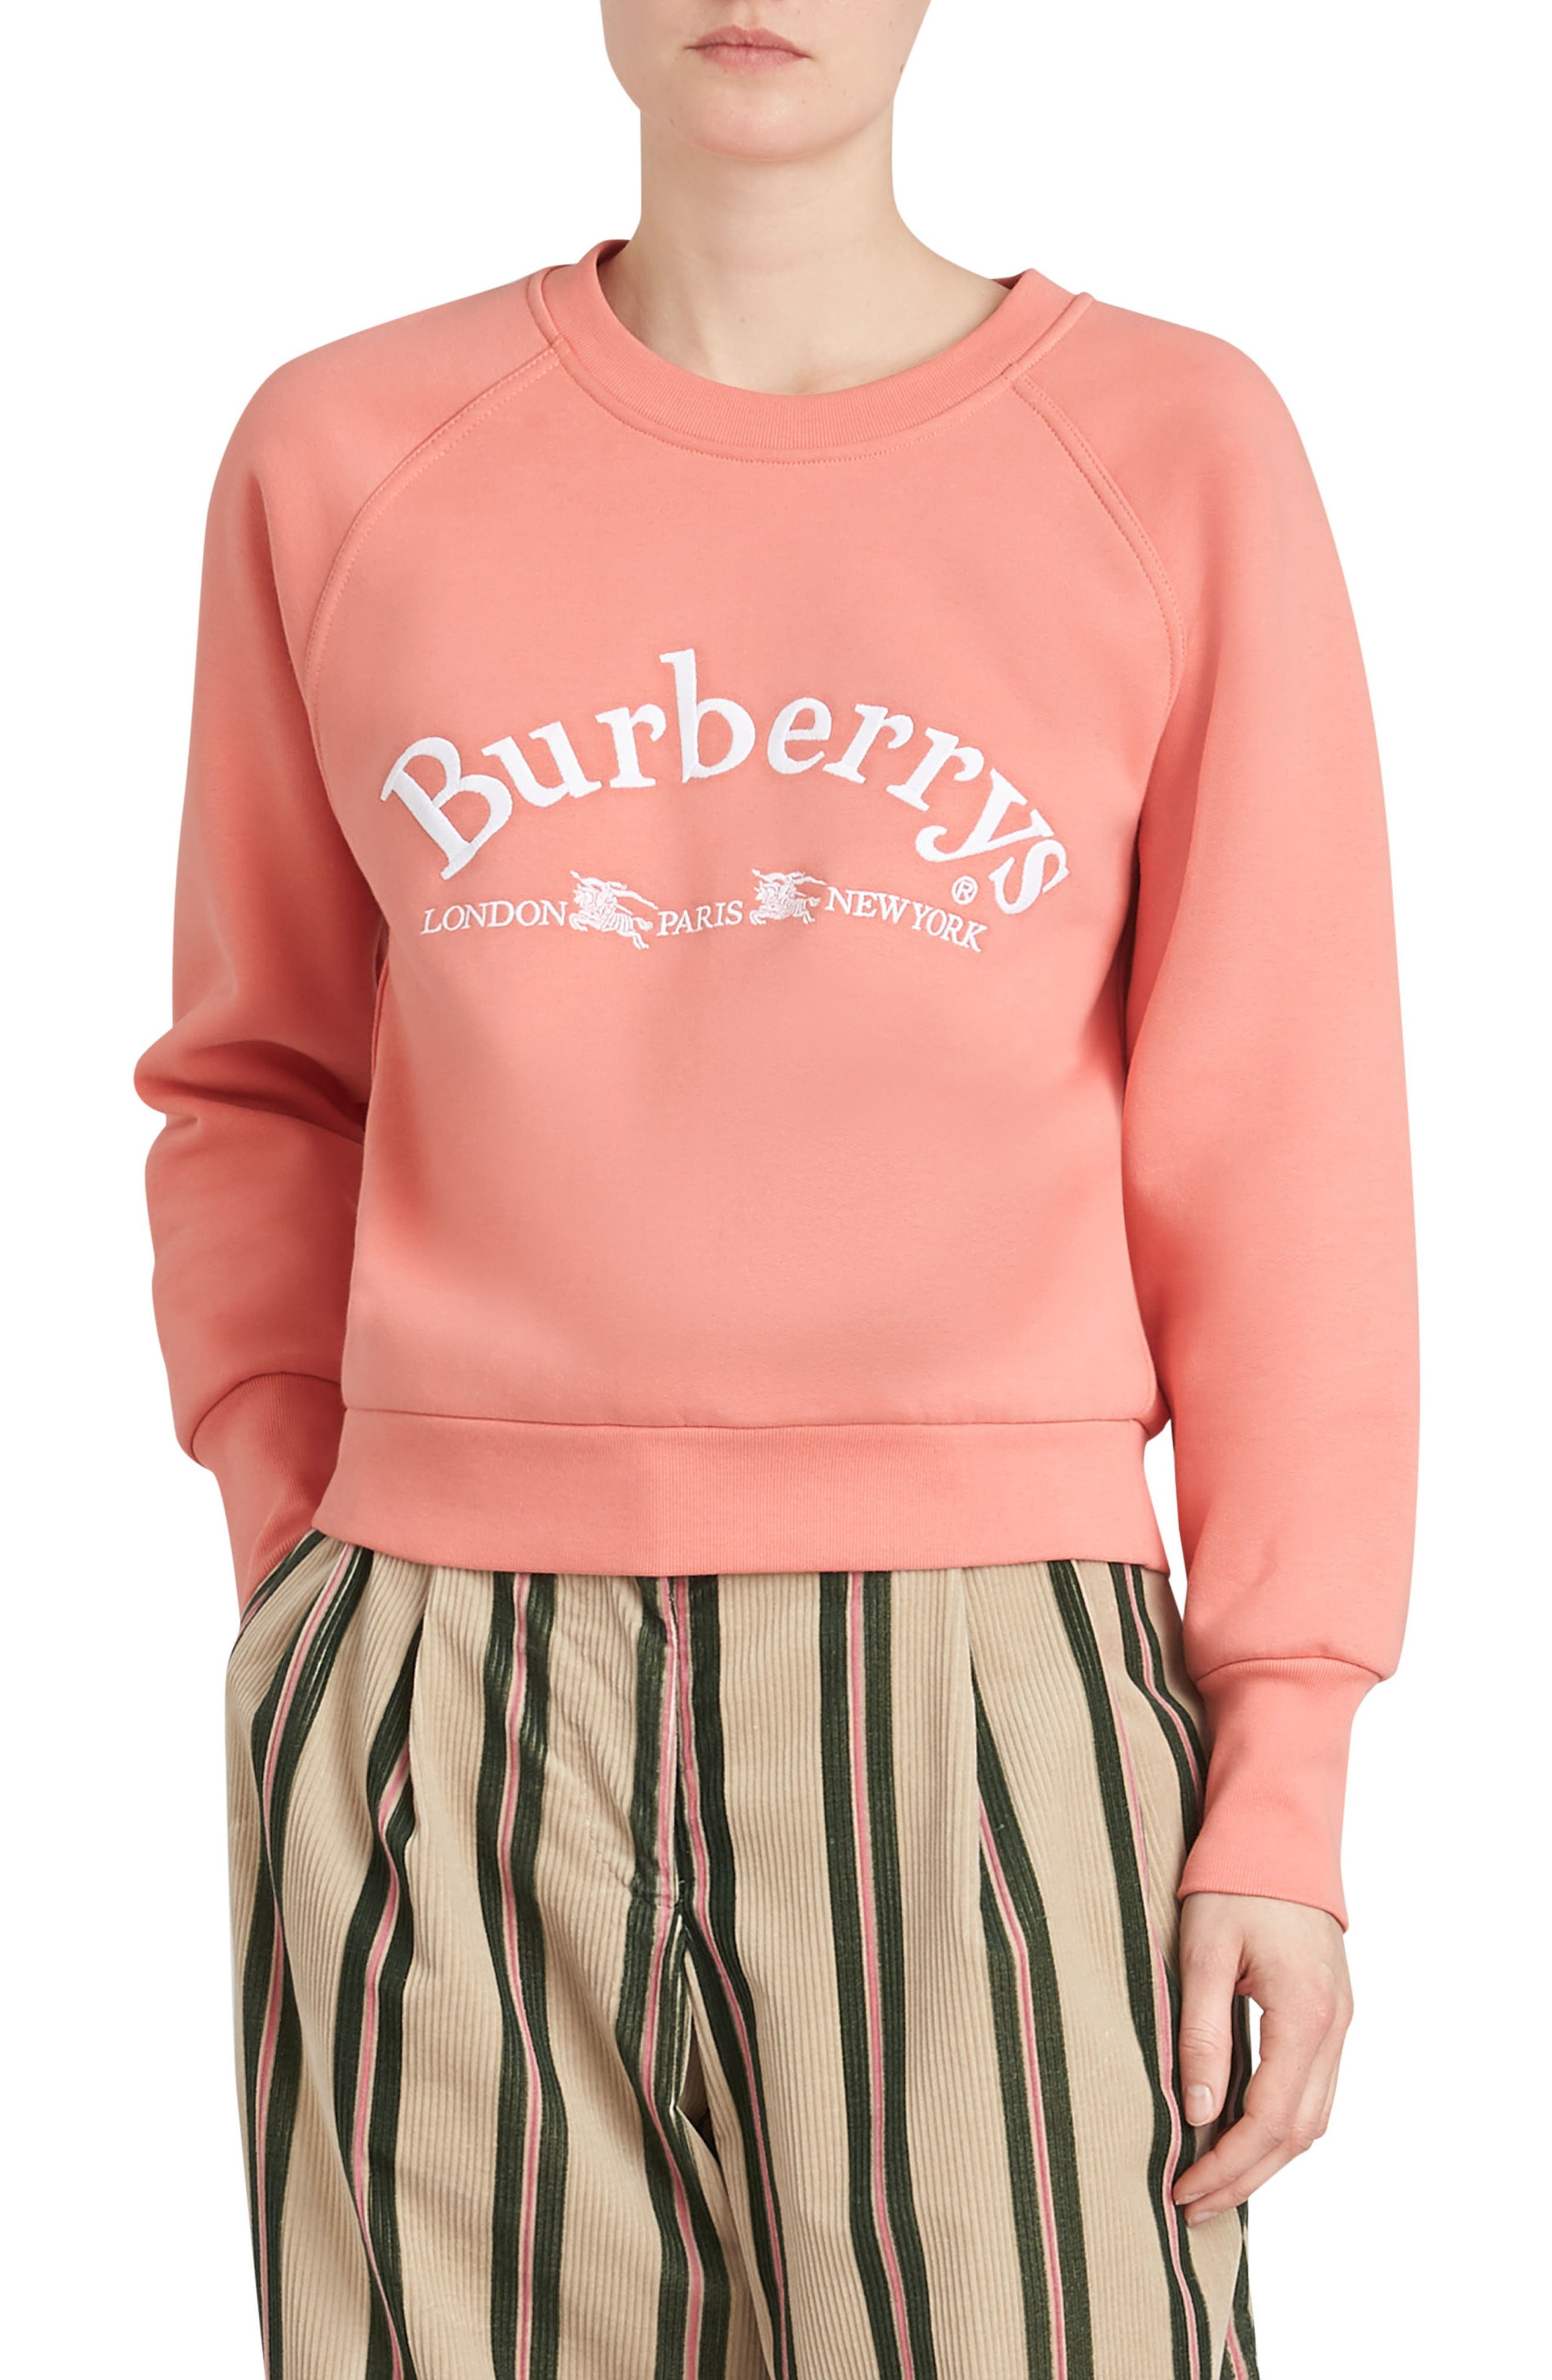 Burberry Battarni Embroidered Logo Sweatshirt